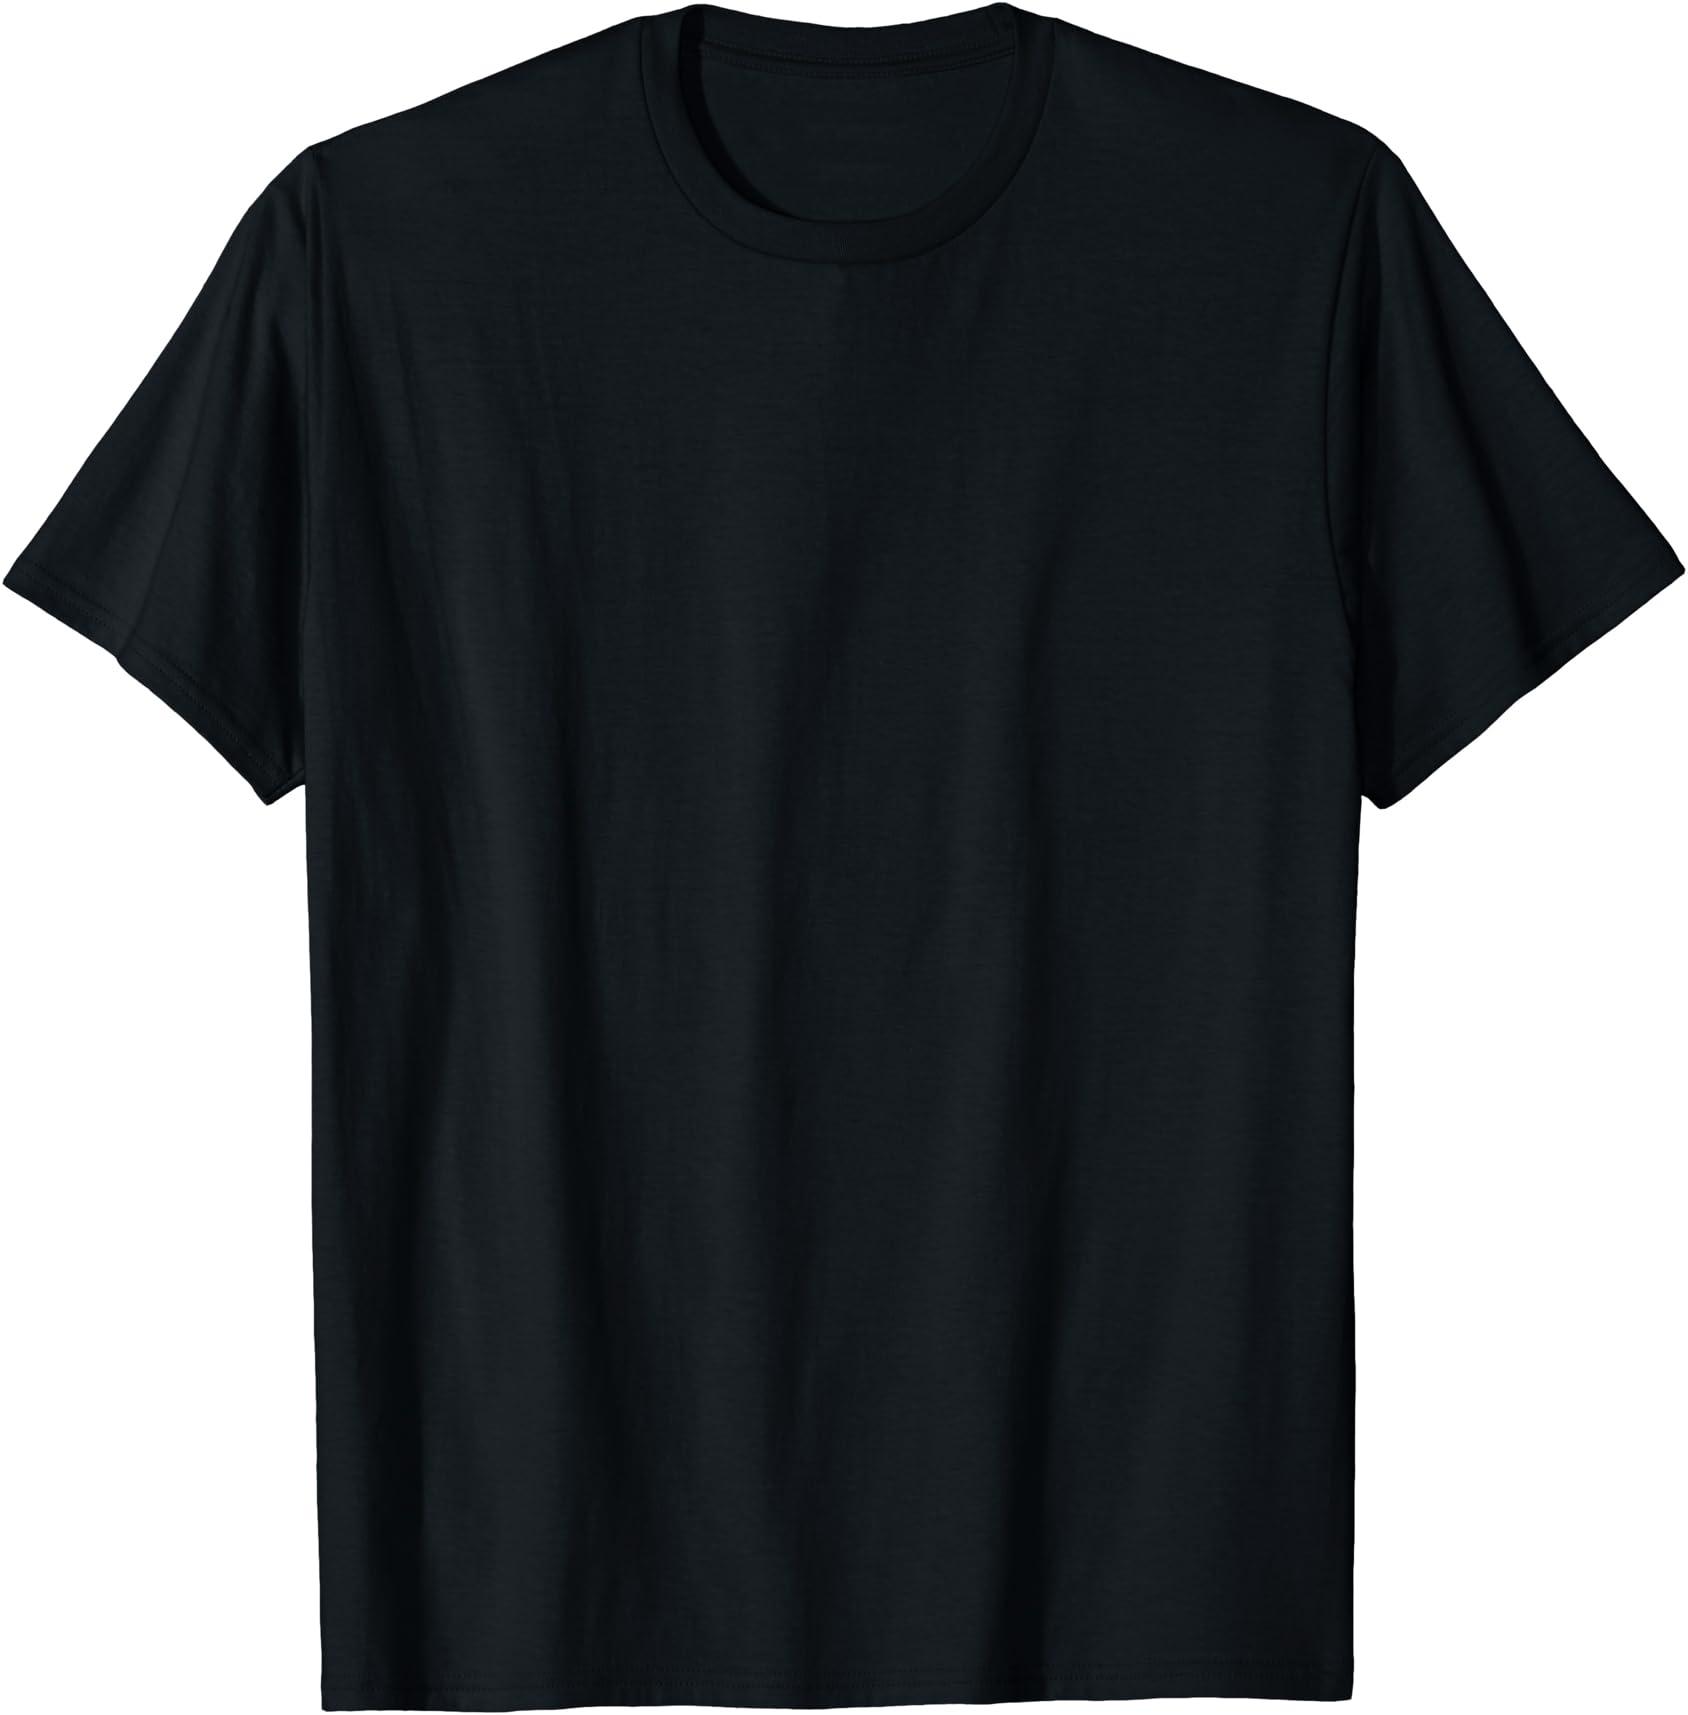 New Women Sublimation Short Sleeve V-Neck Shirt New York USA Towers Sizes S-2XL